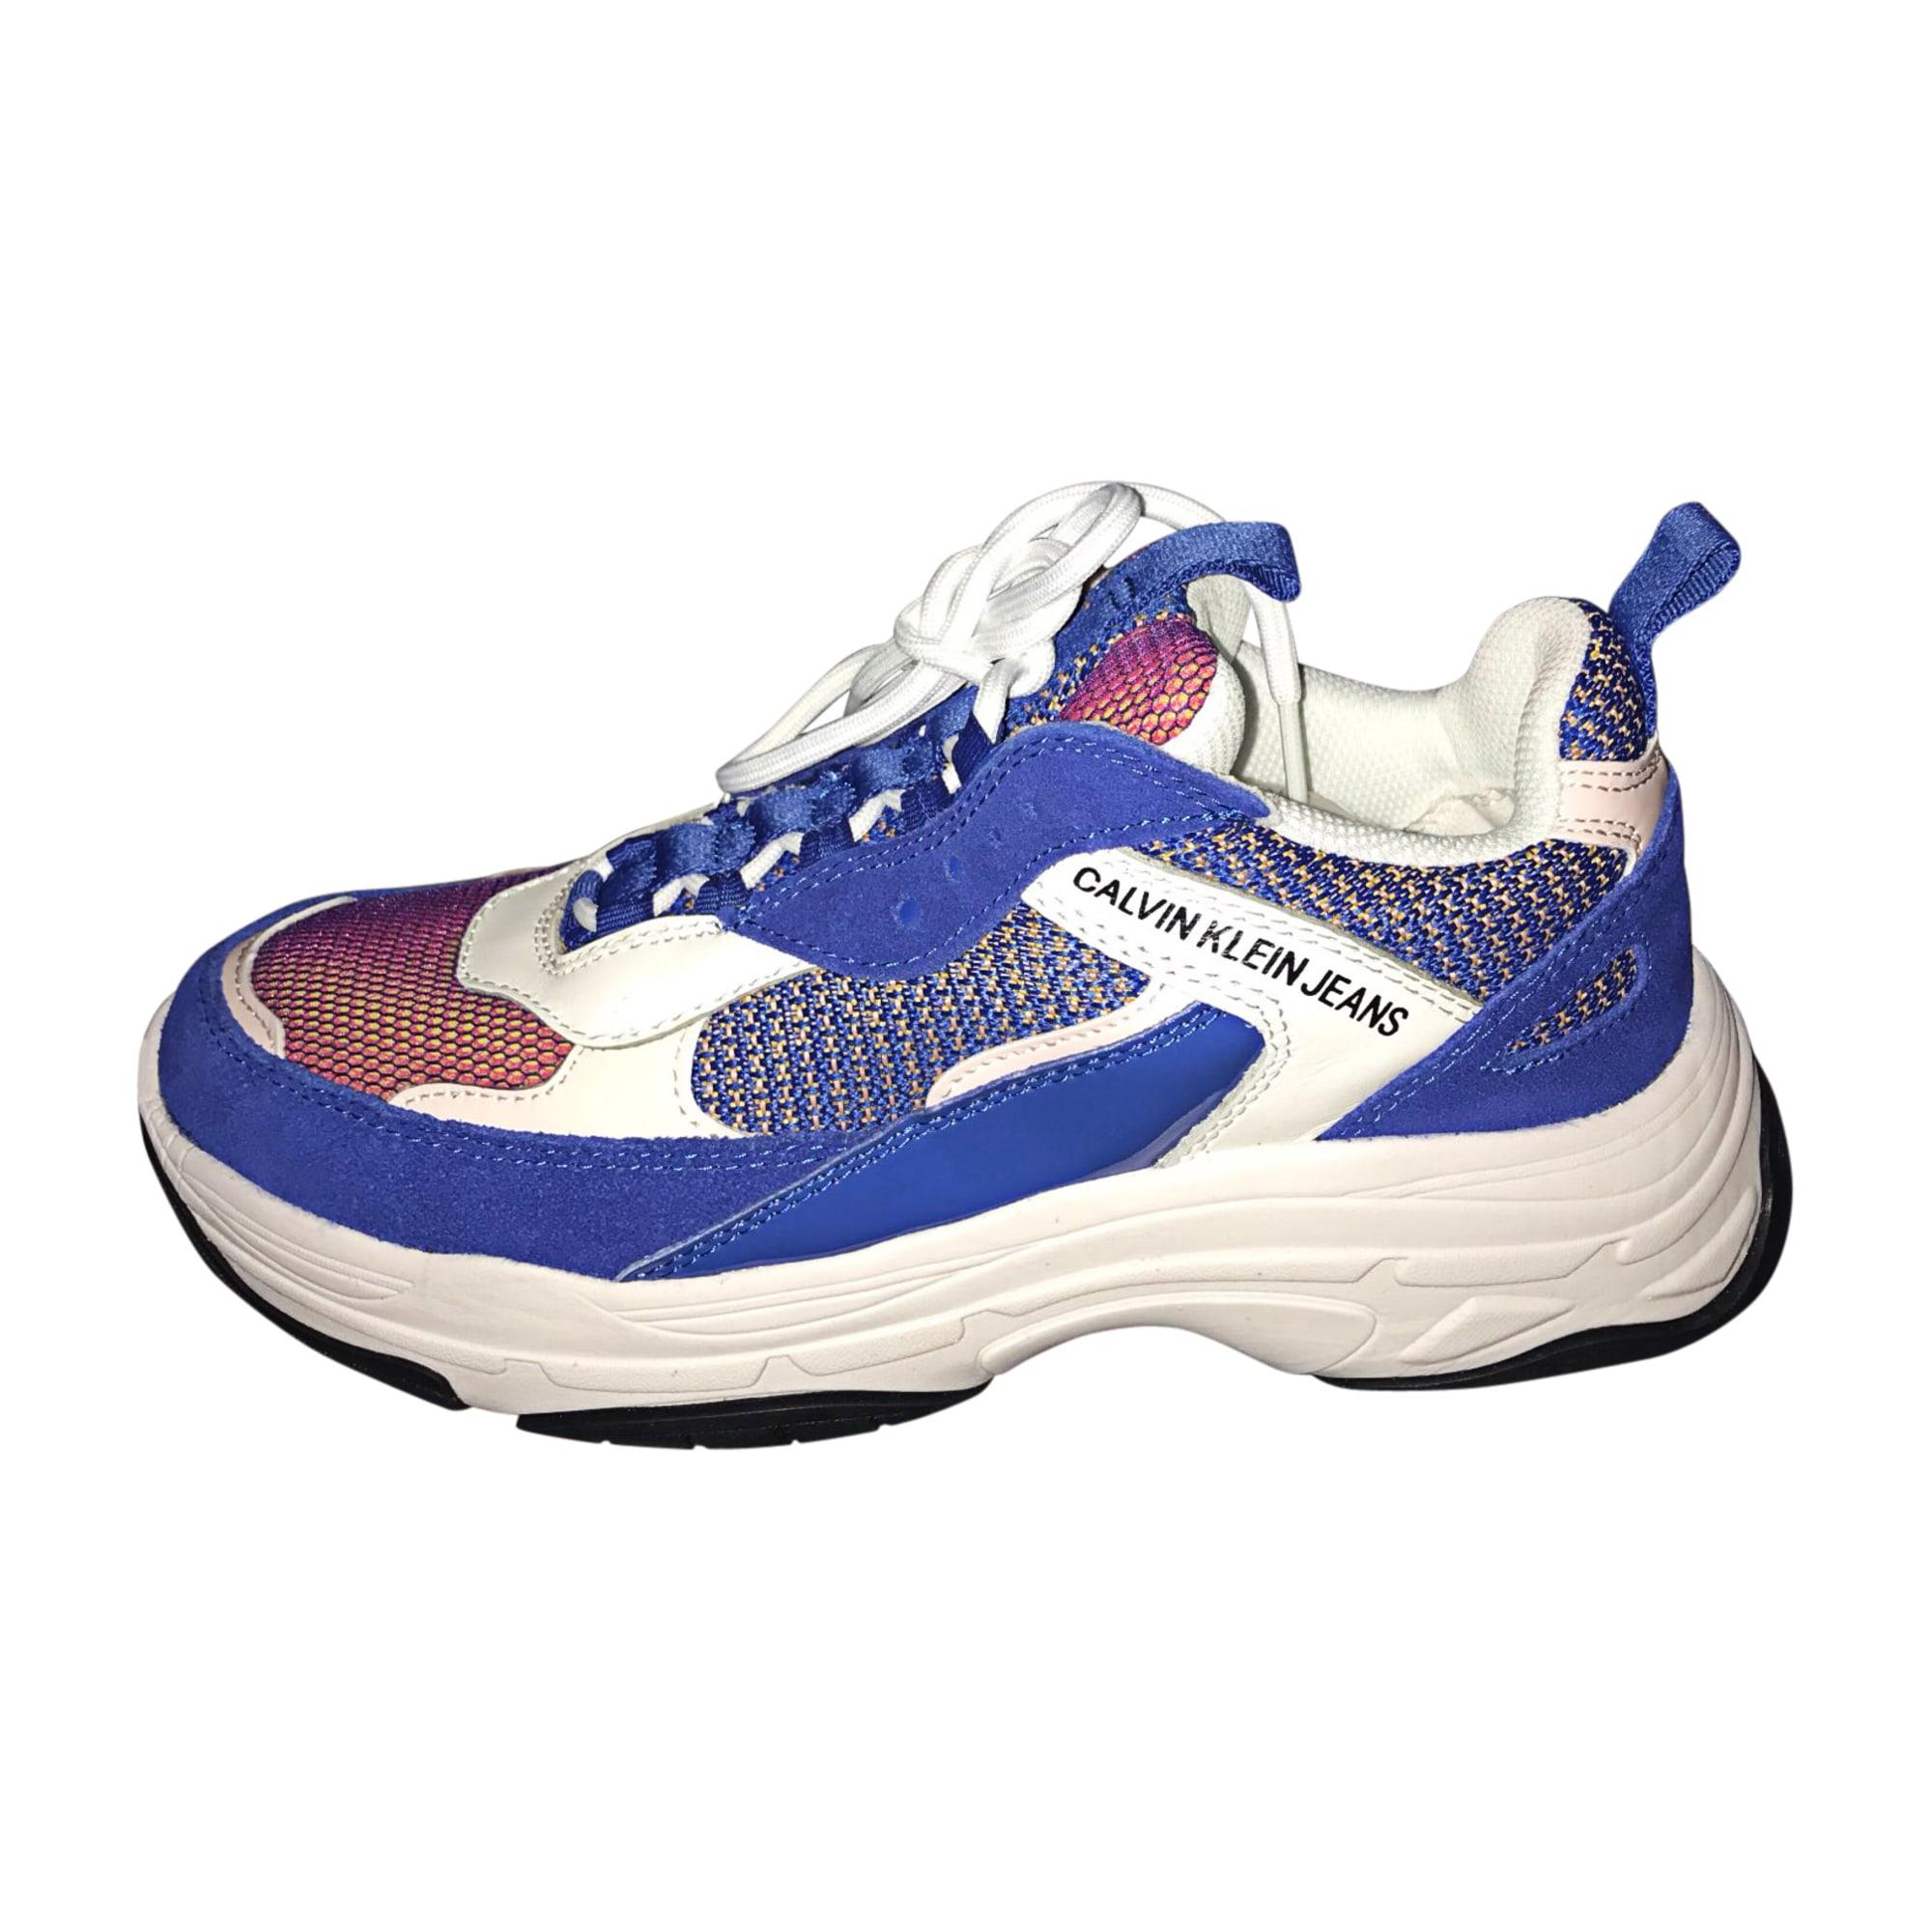 Baskets CALVIN KLEIN Bleu, bleu marine, bleu turquoise